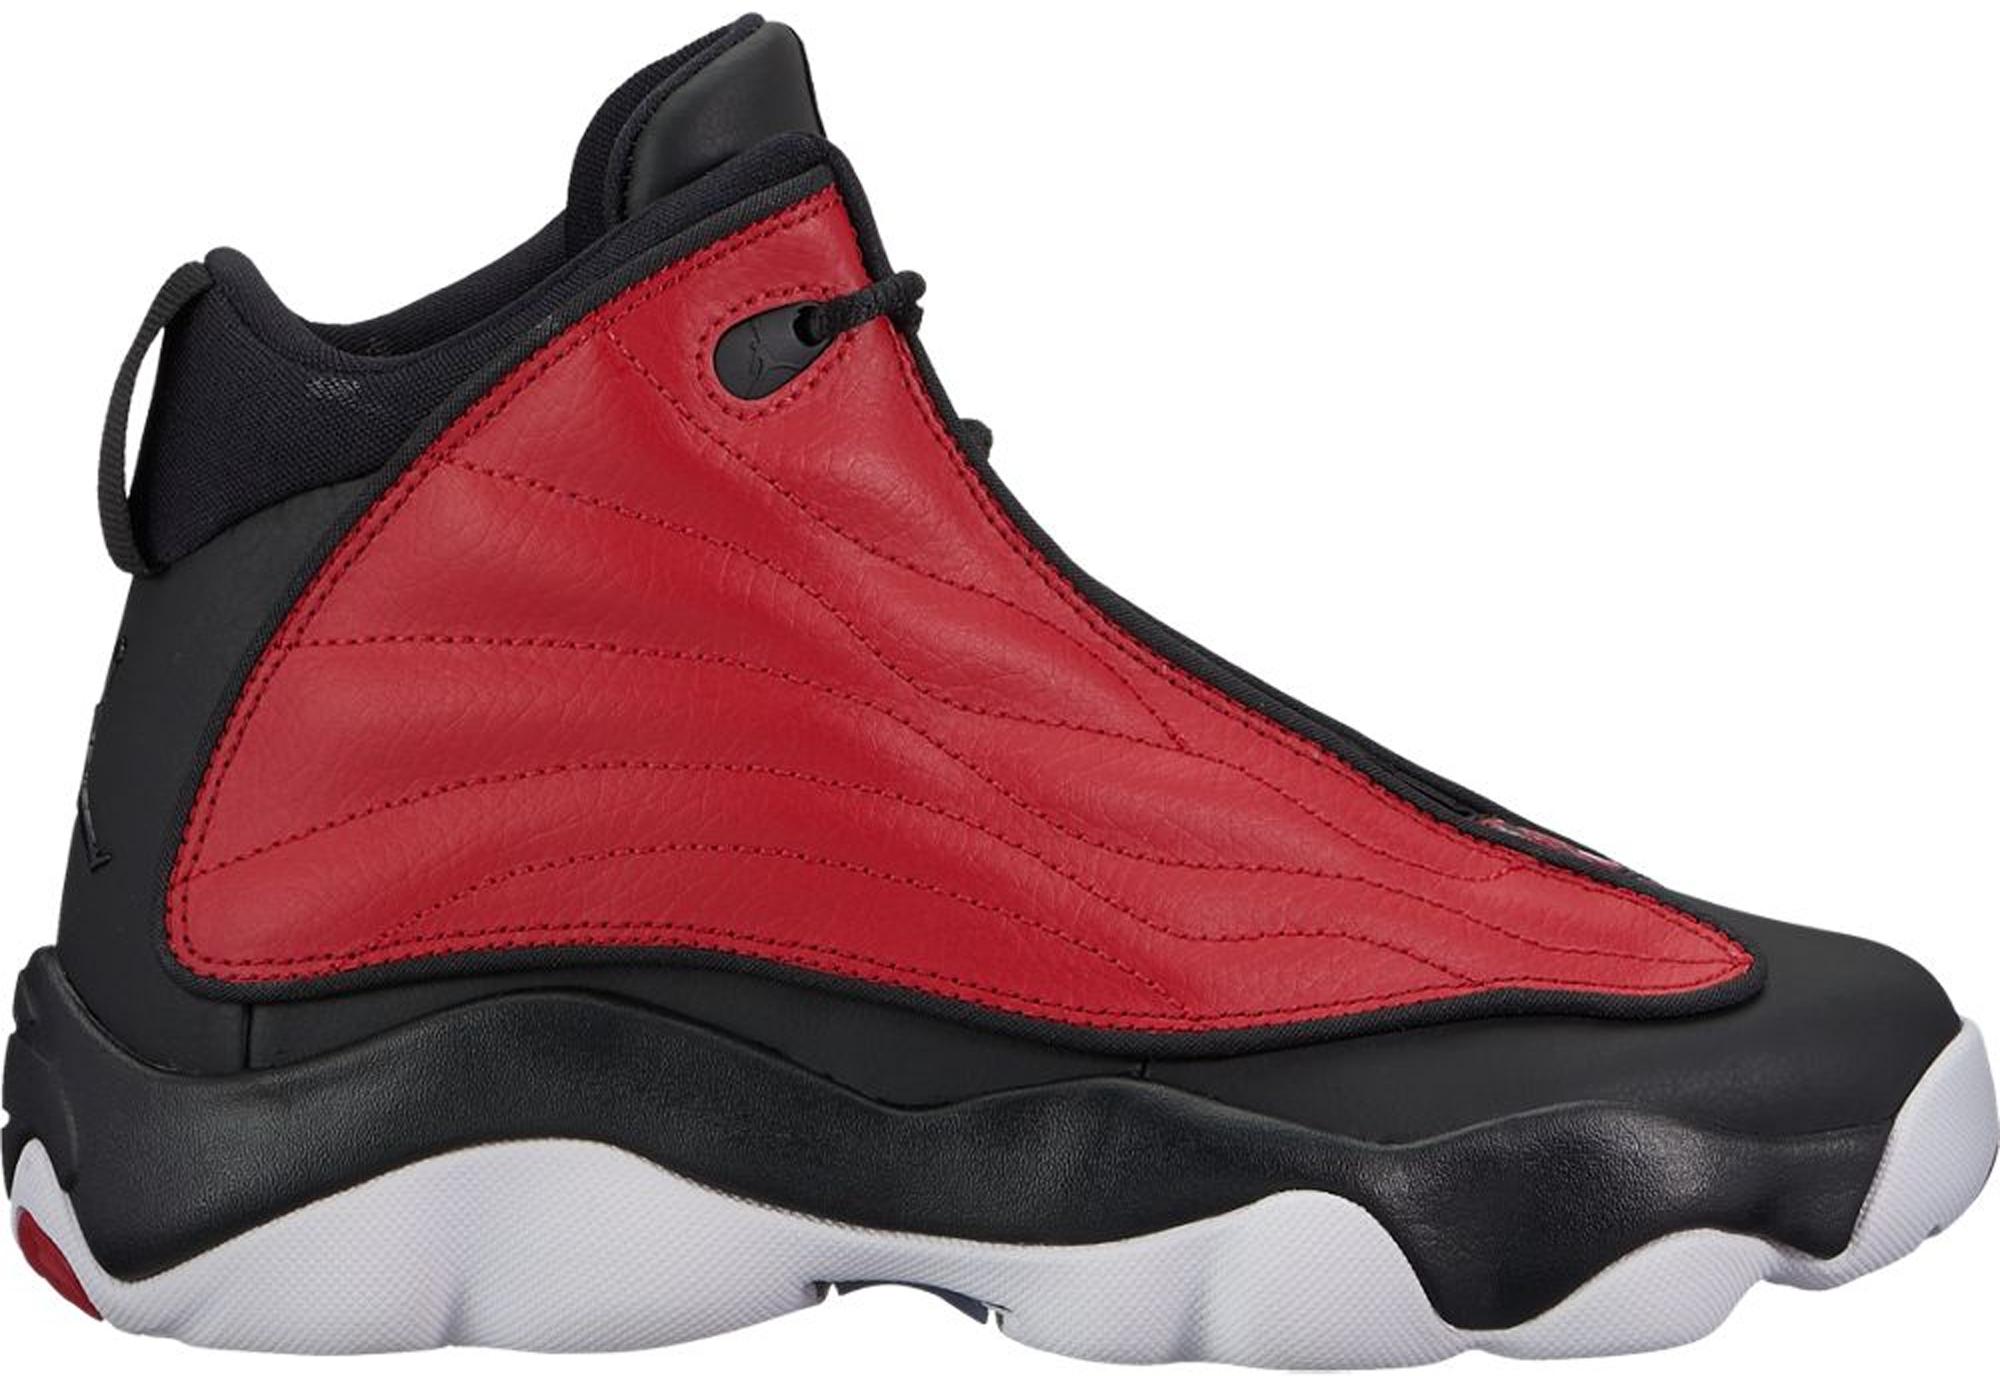 Nike Air Jordan Pro Strong Red Black White GS Grade School Sz 5 407484-601